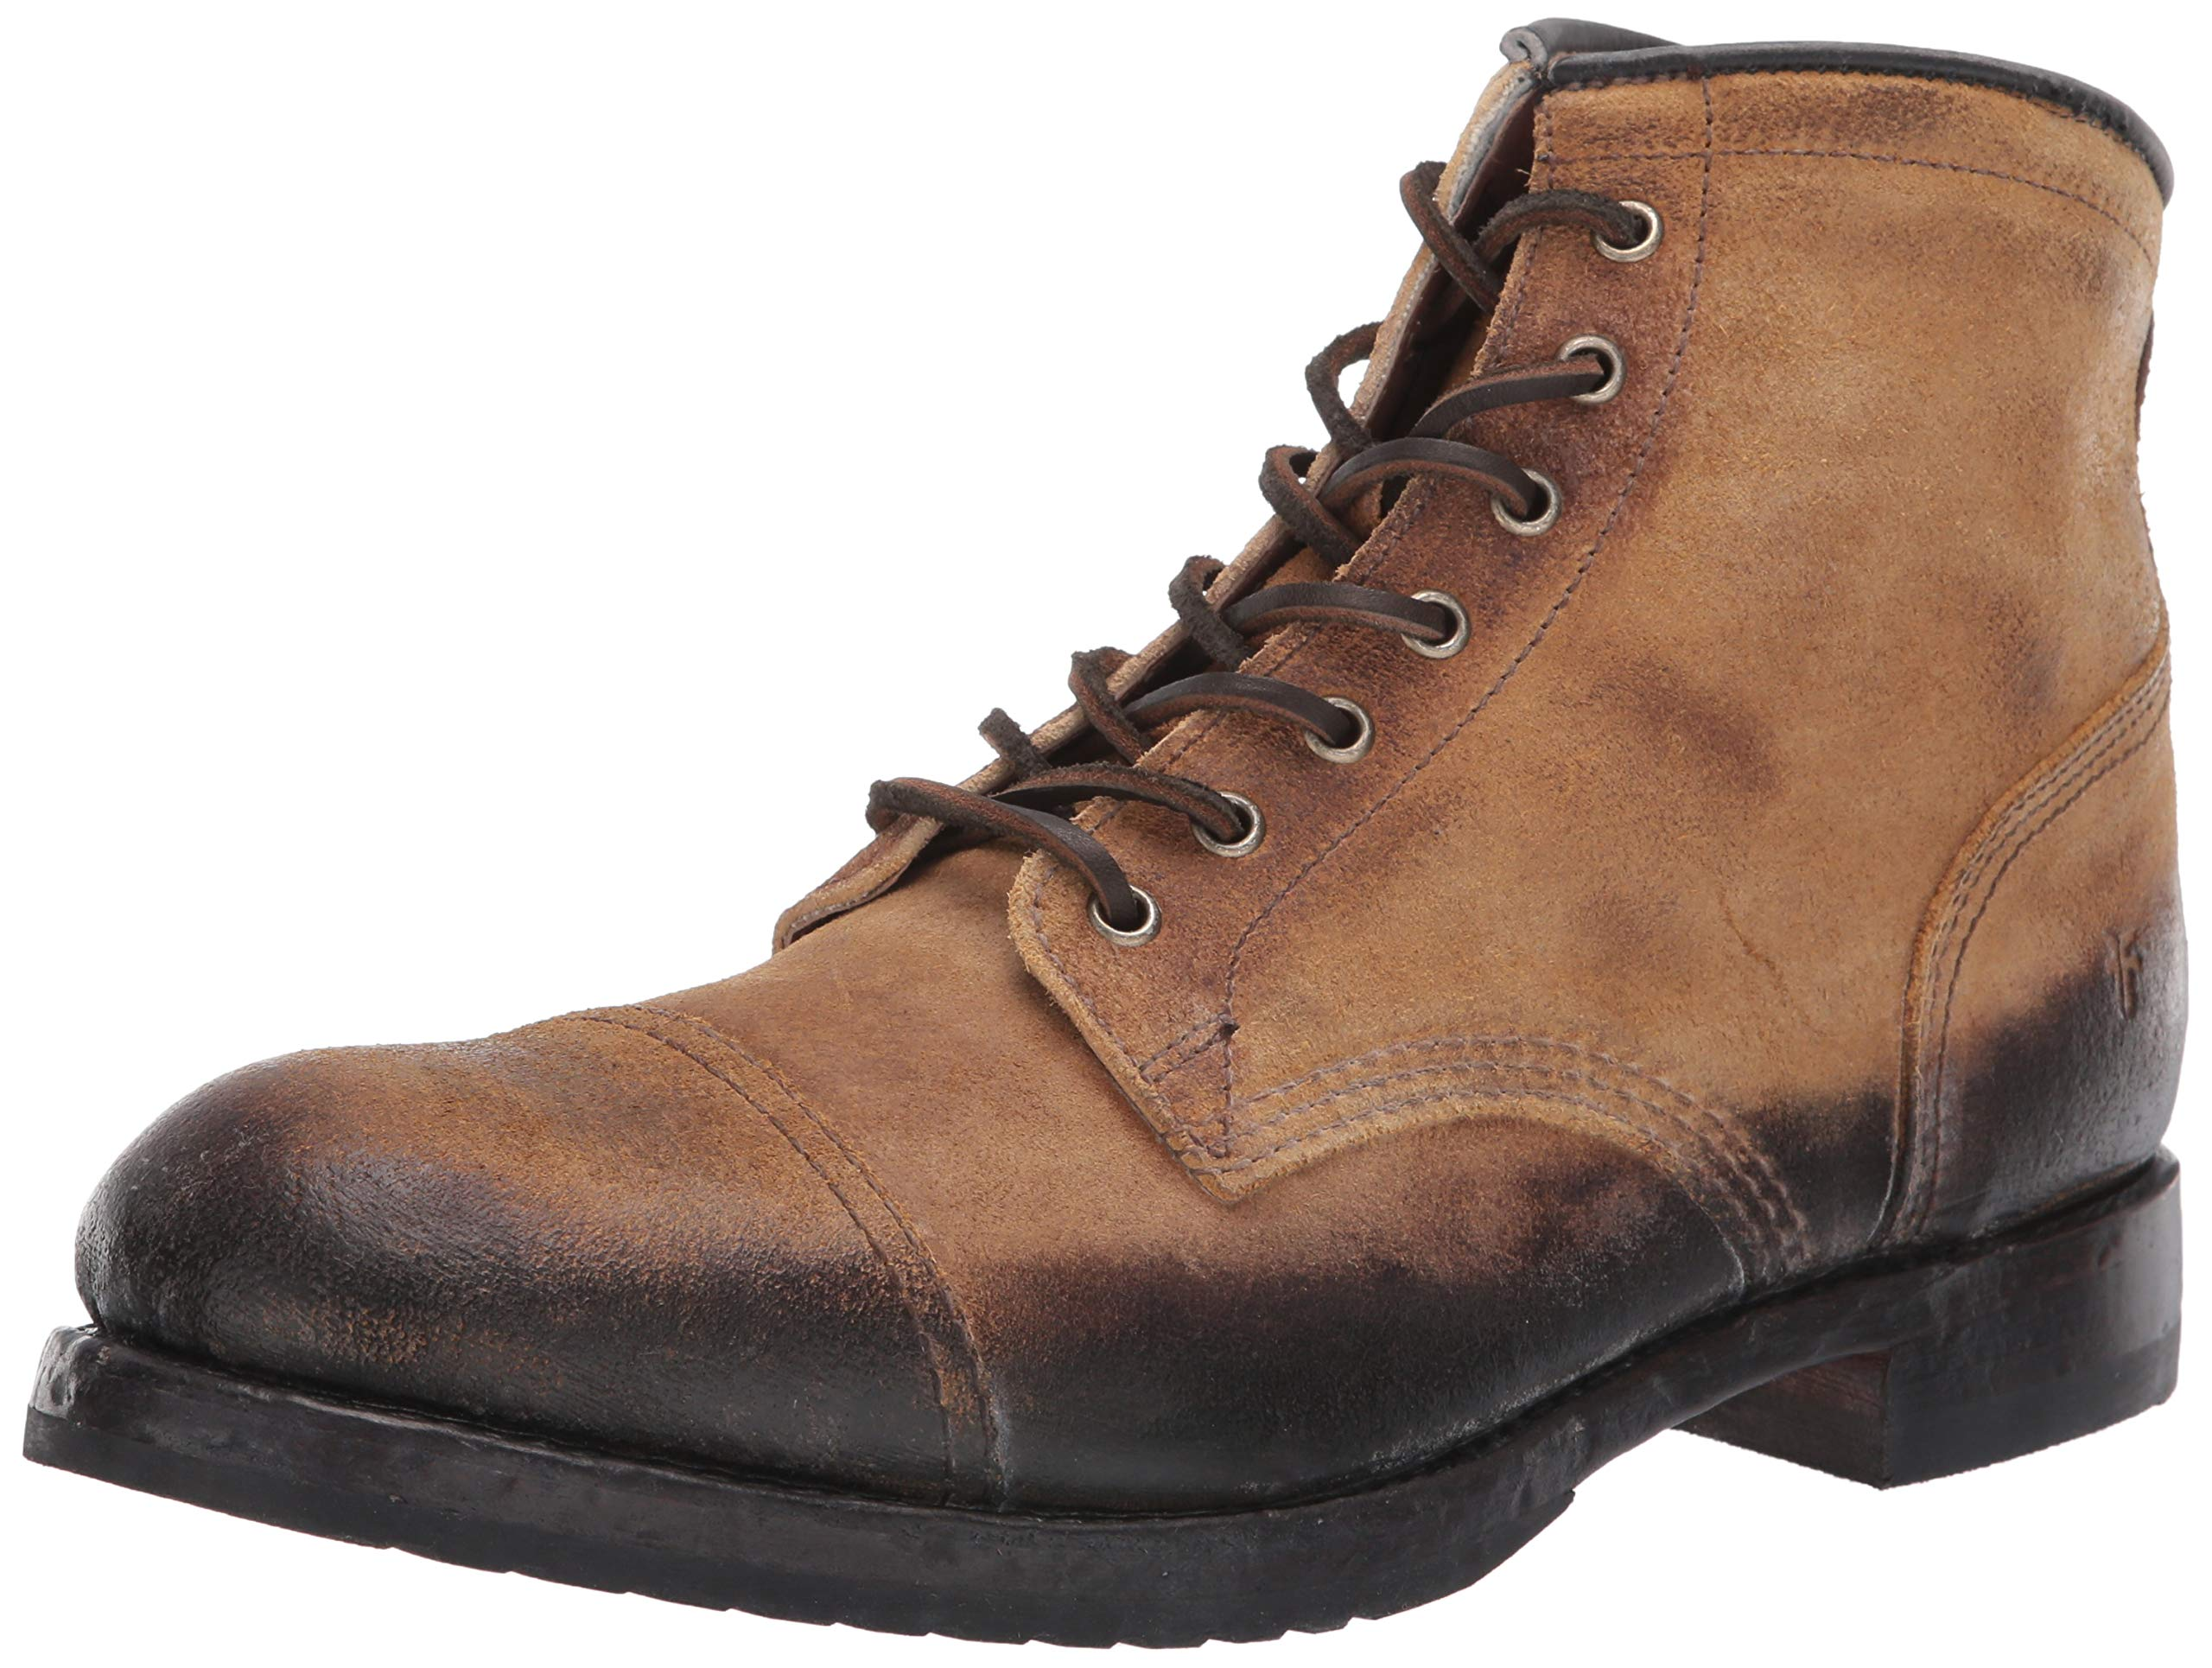 Frye Men's Logan Cap Toe Fashion Boot